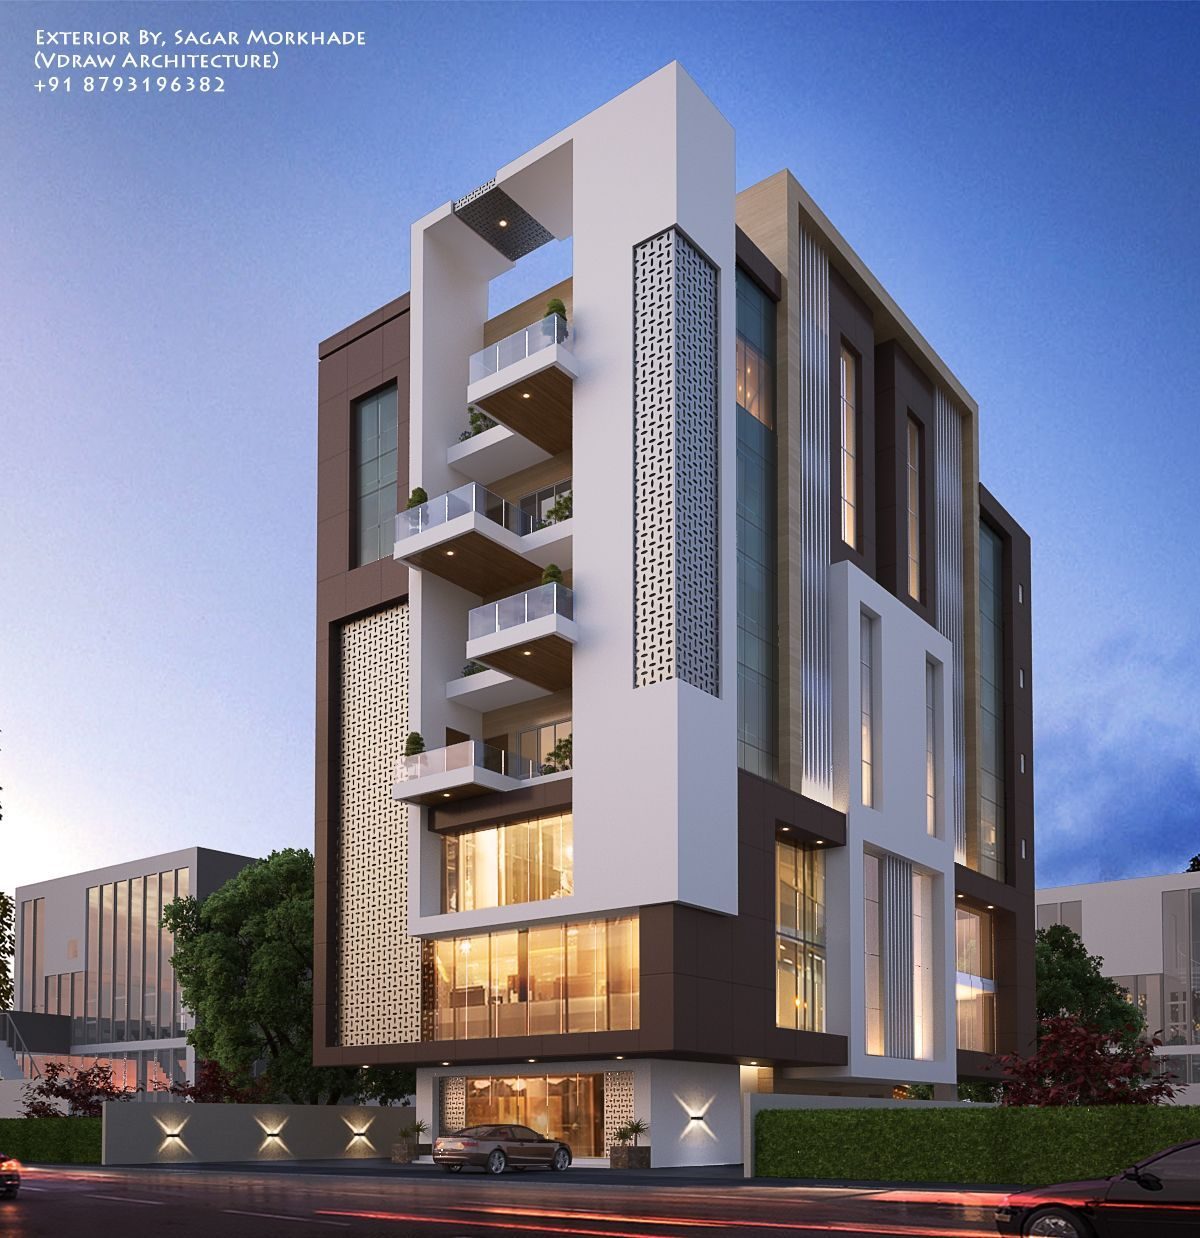 Modern Residential Exterior By Ar Sagar Morkhade: Exterior By, Sagar Morkhade (Vdraw Architecture) +91